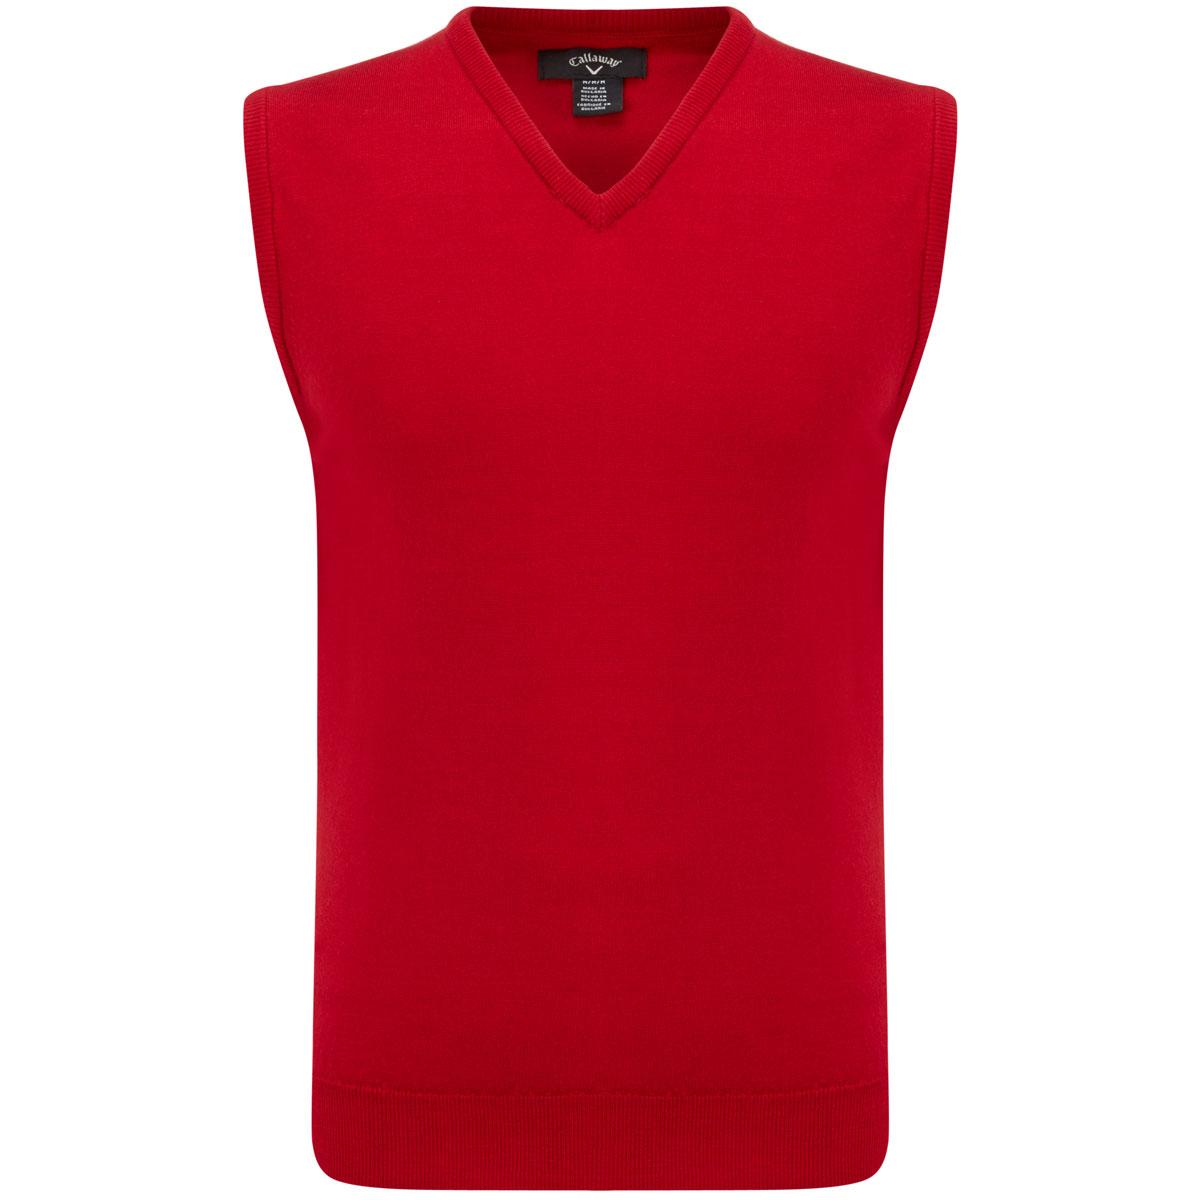 Callaway golf Callaway V-neck pánská pletená vesta červená XL